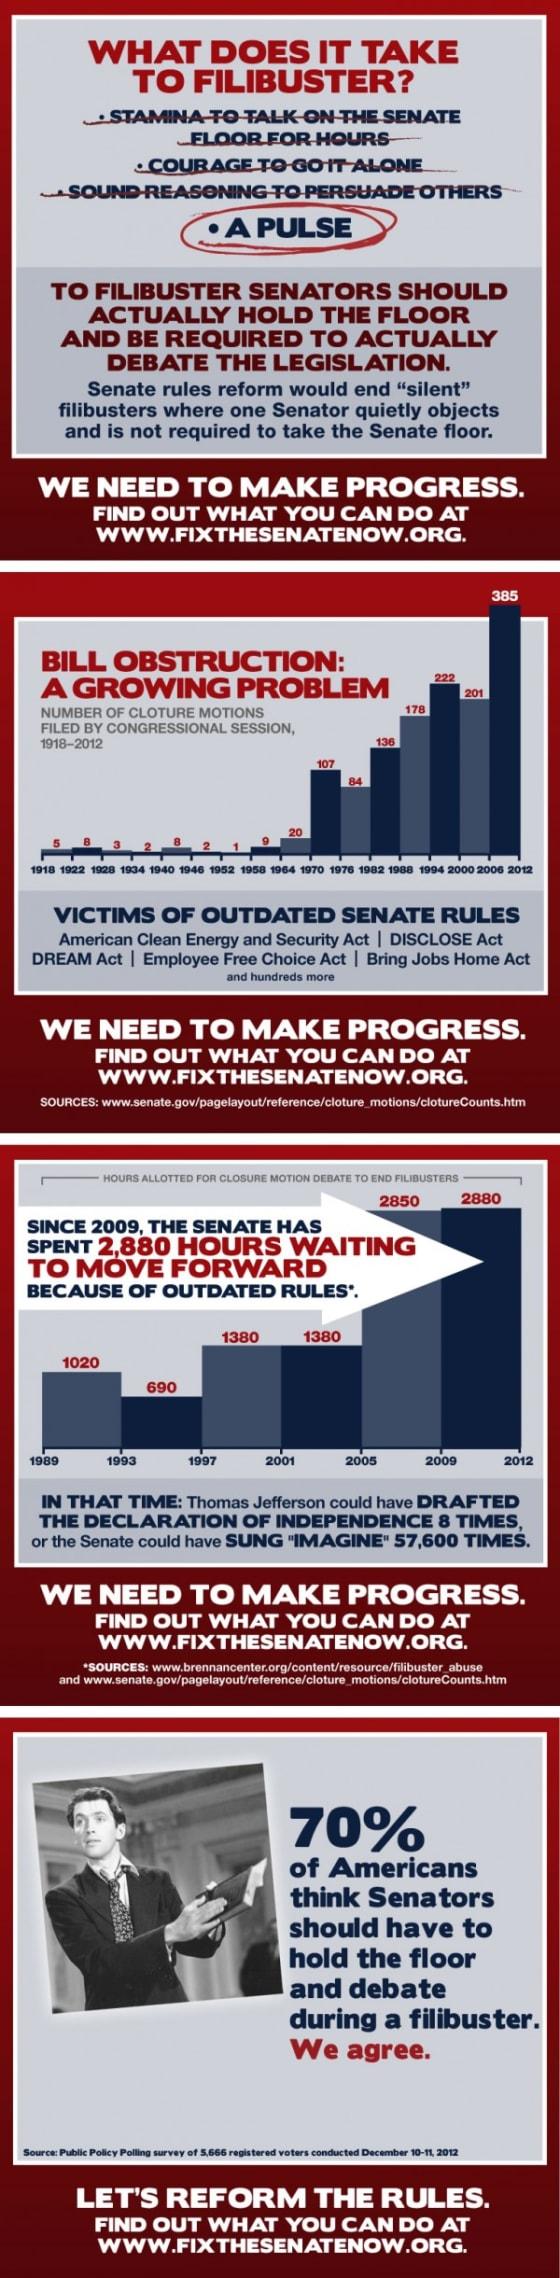 Fix The Senate Now